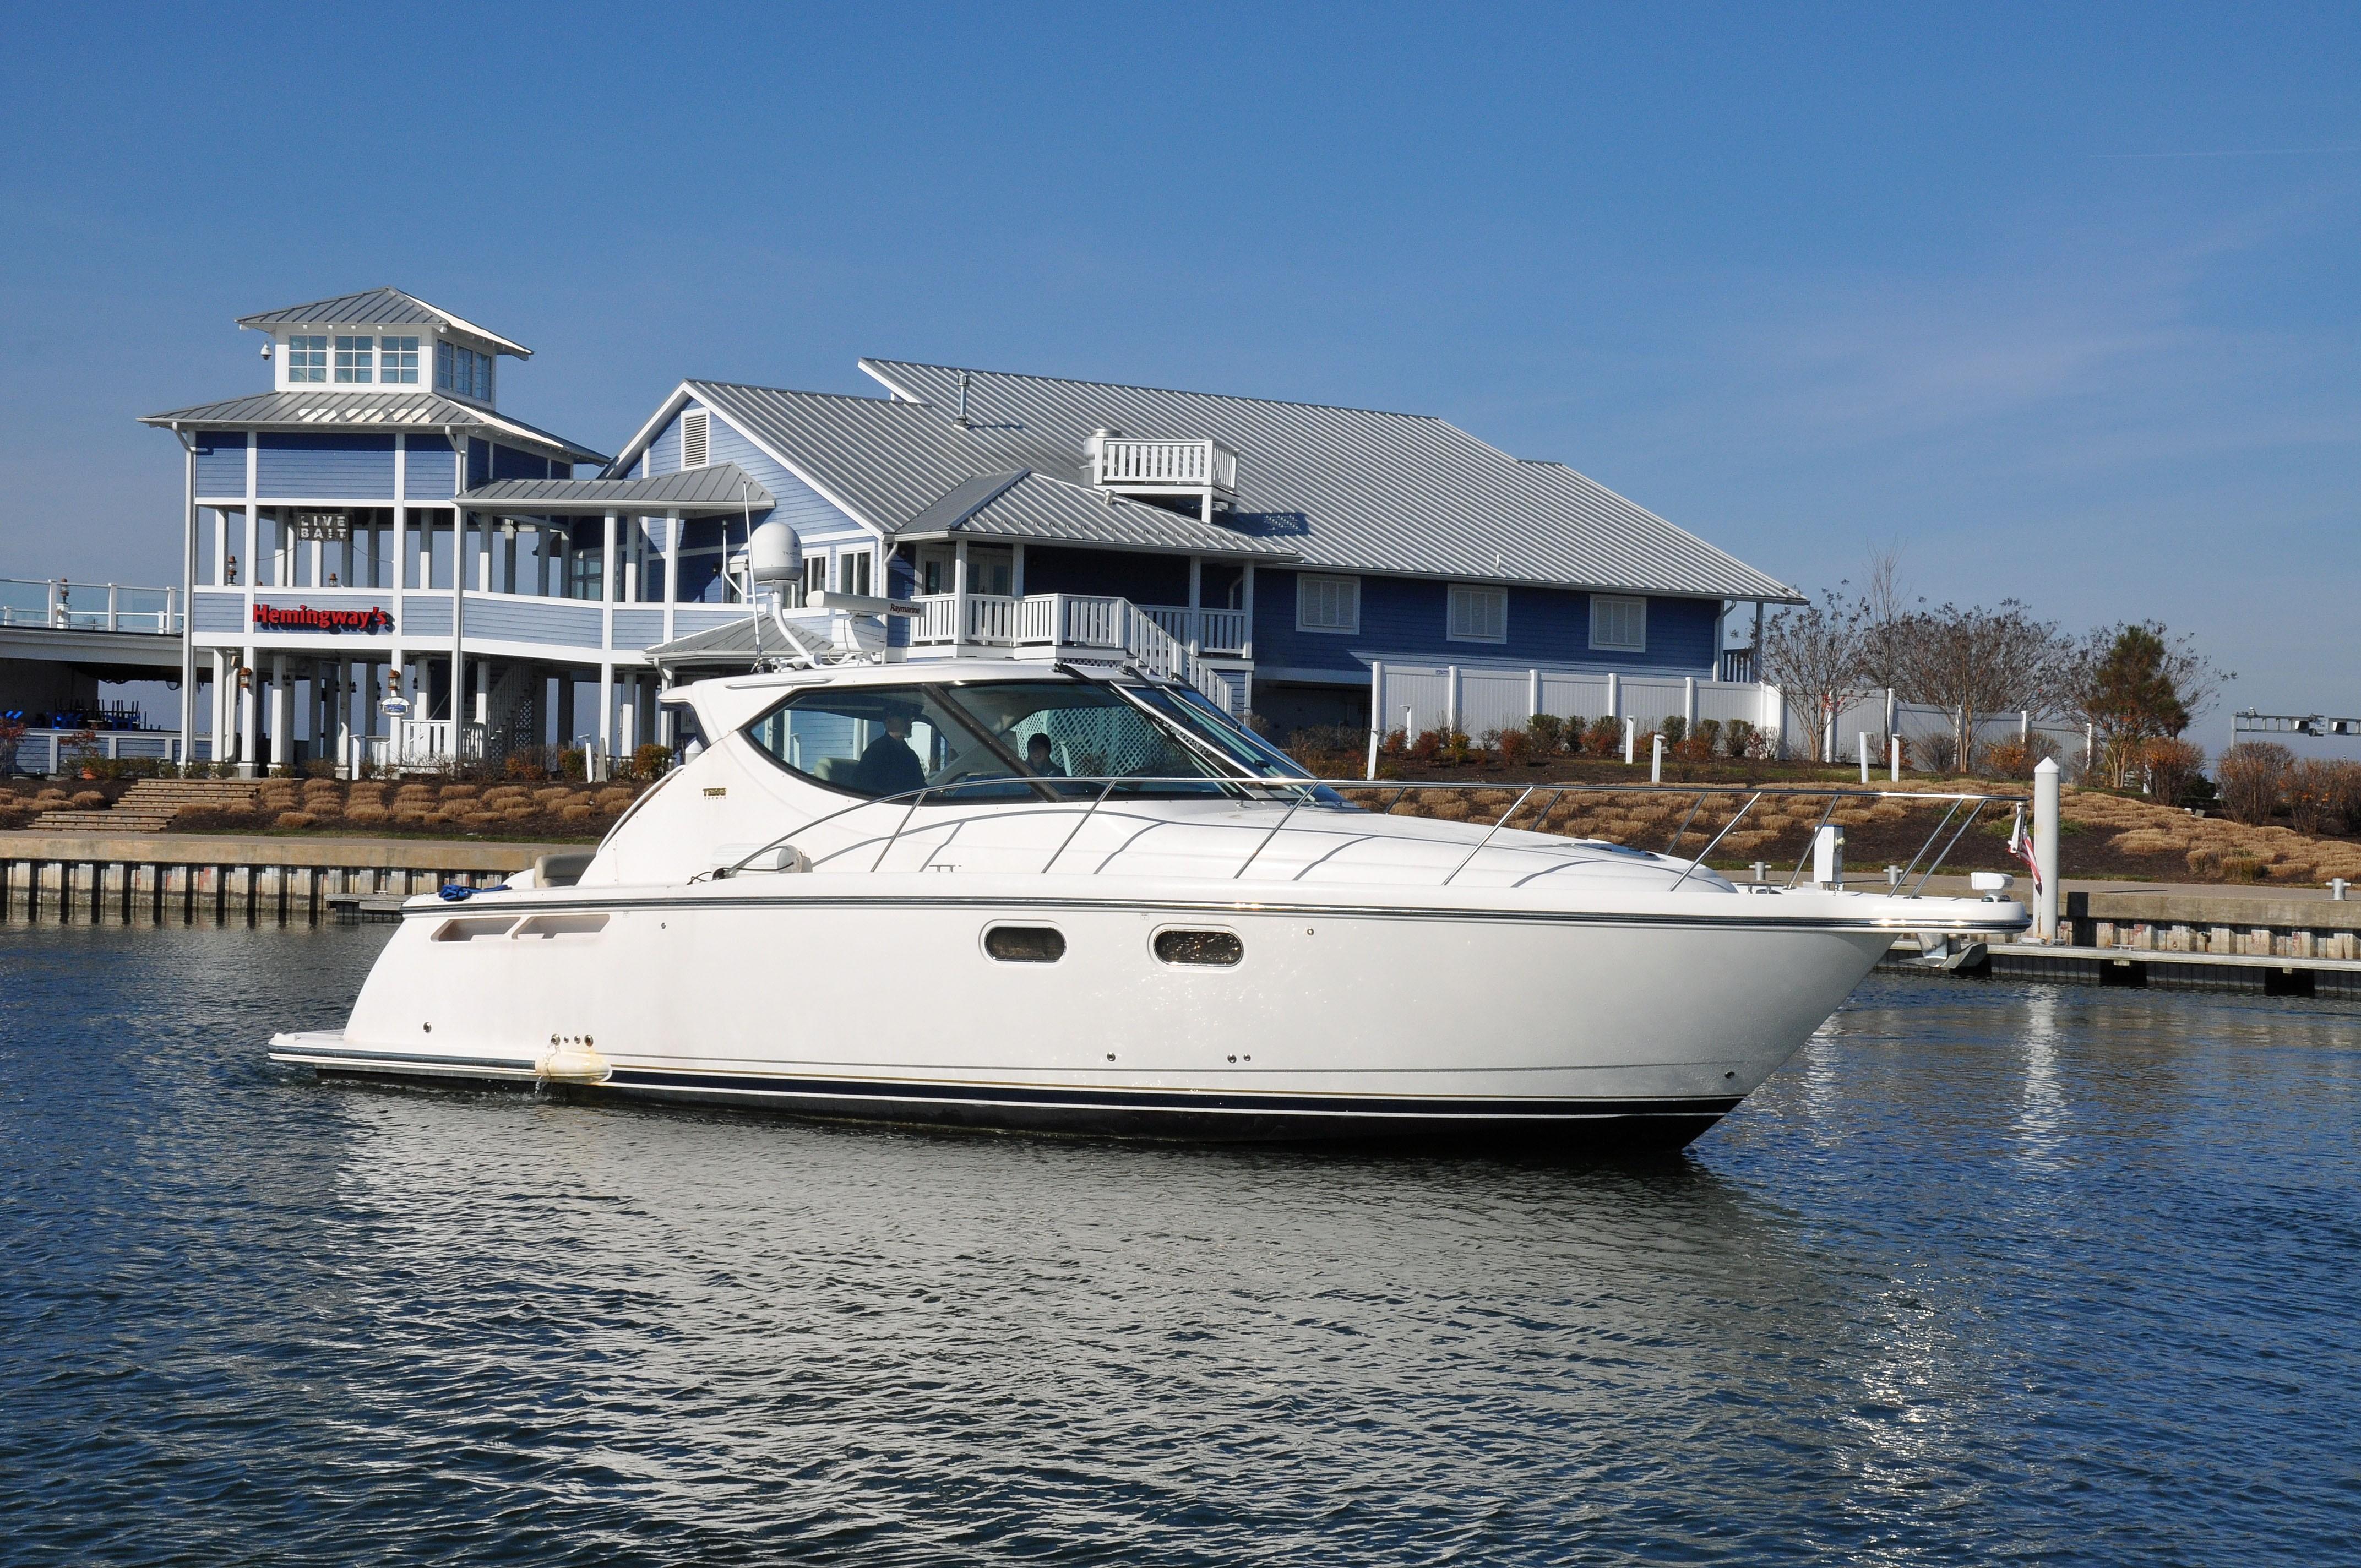 2008 Tiara 3900 Sovran Power Boat For Sale Www